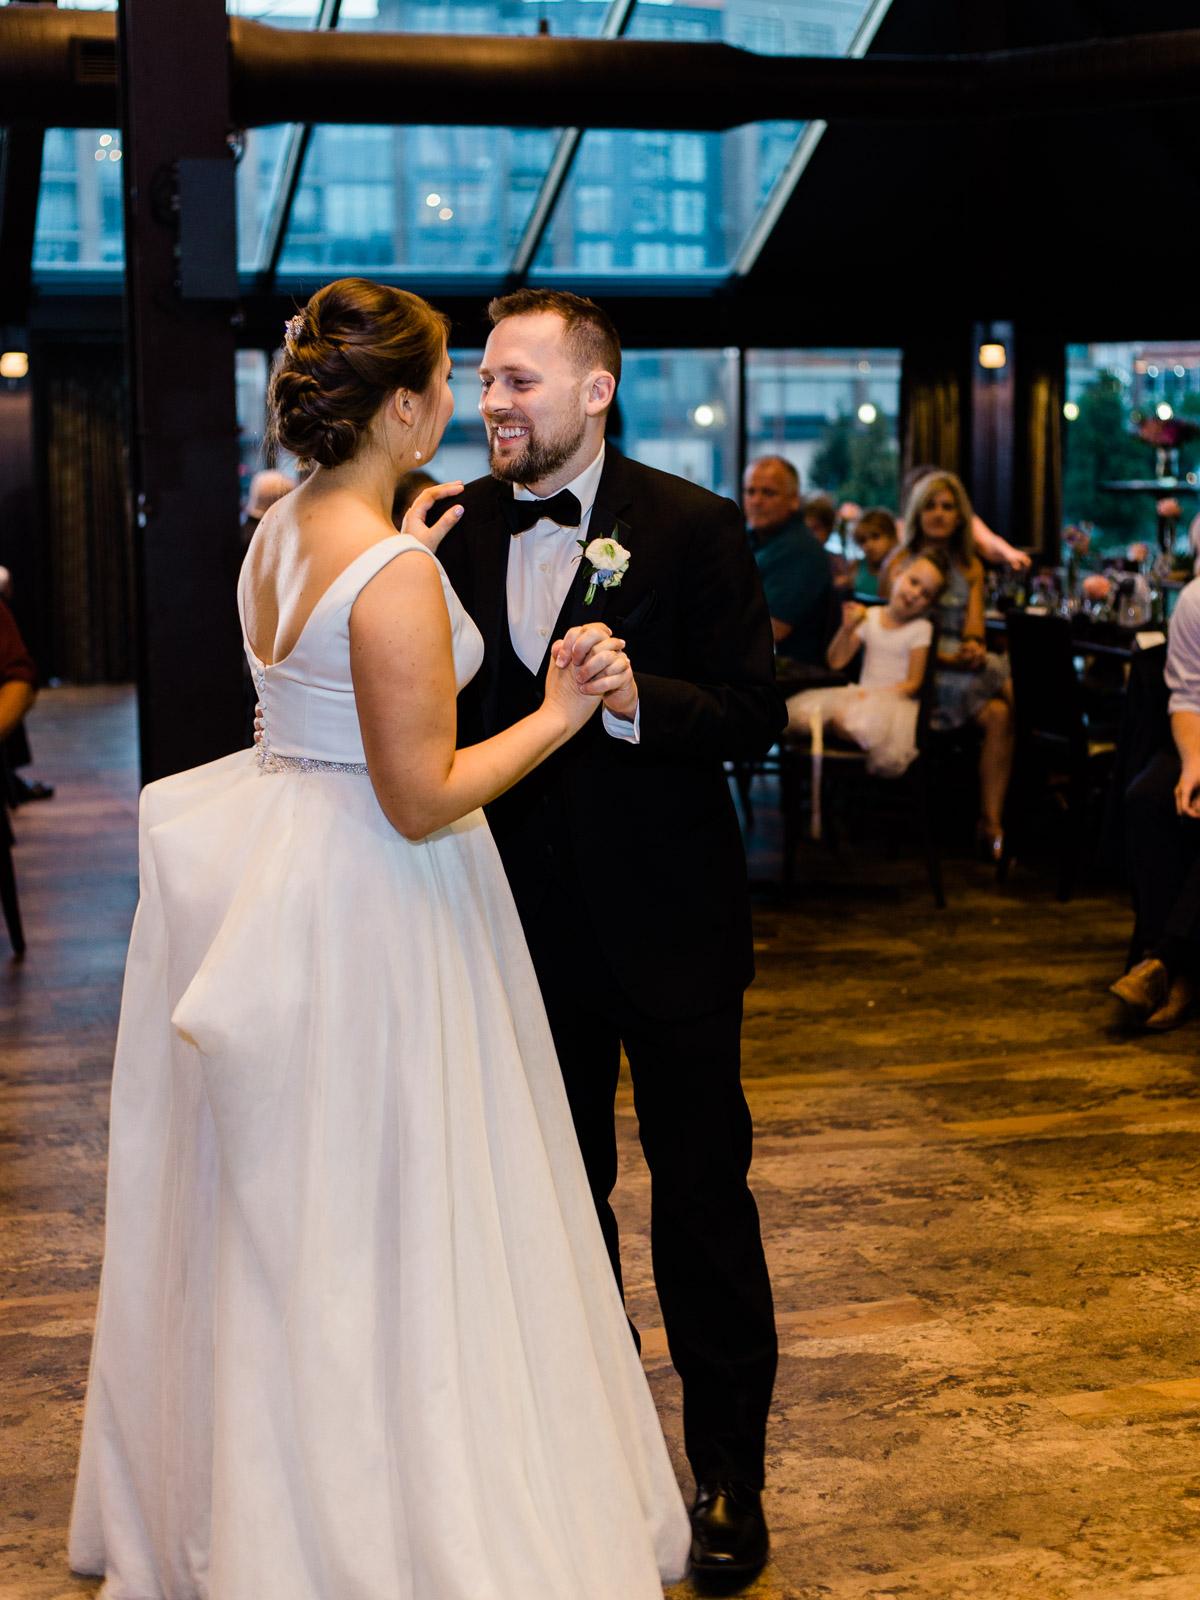 Bright and Joyful Cleveland Wedding Photography at Music Box Supper Club-41.jpg